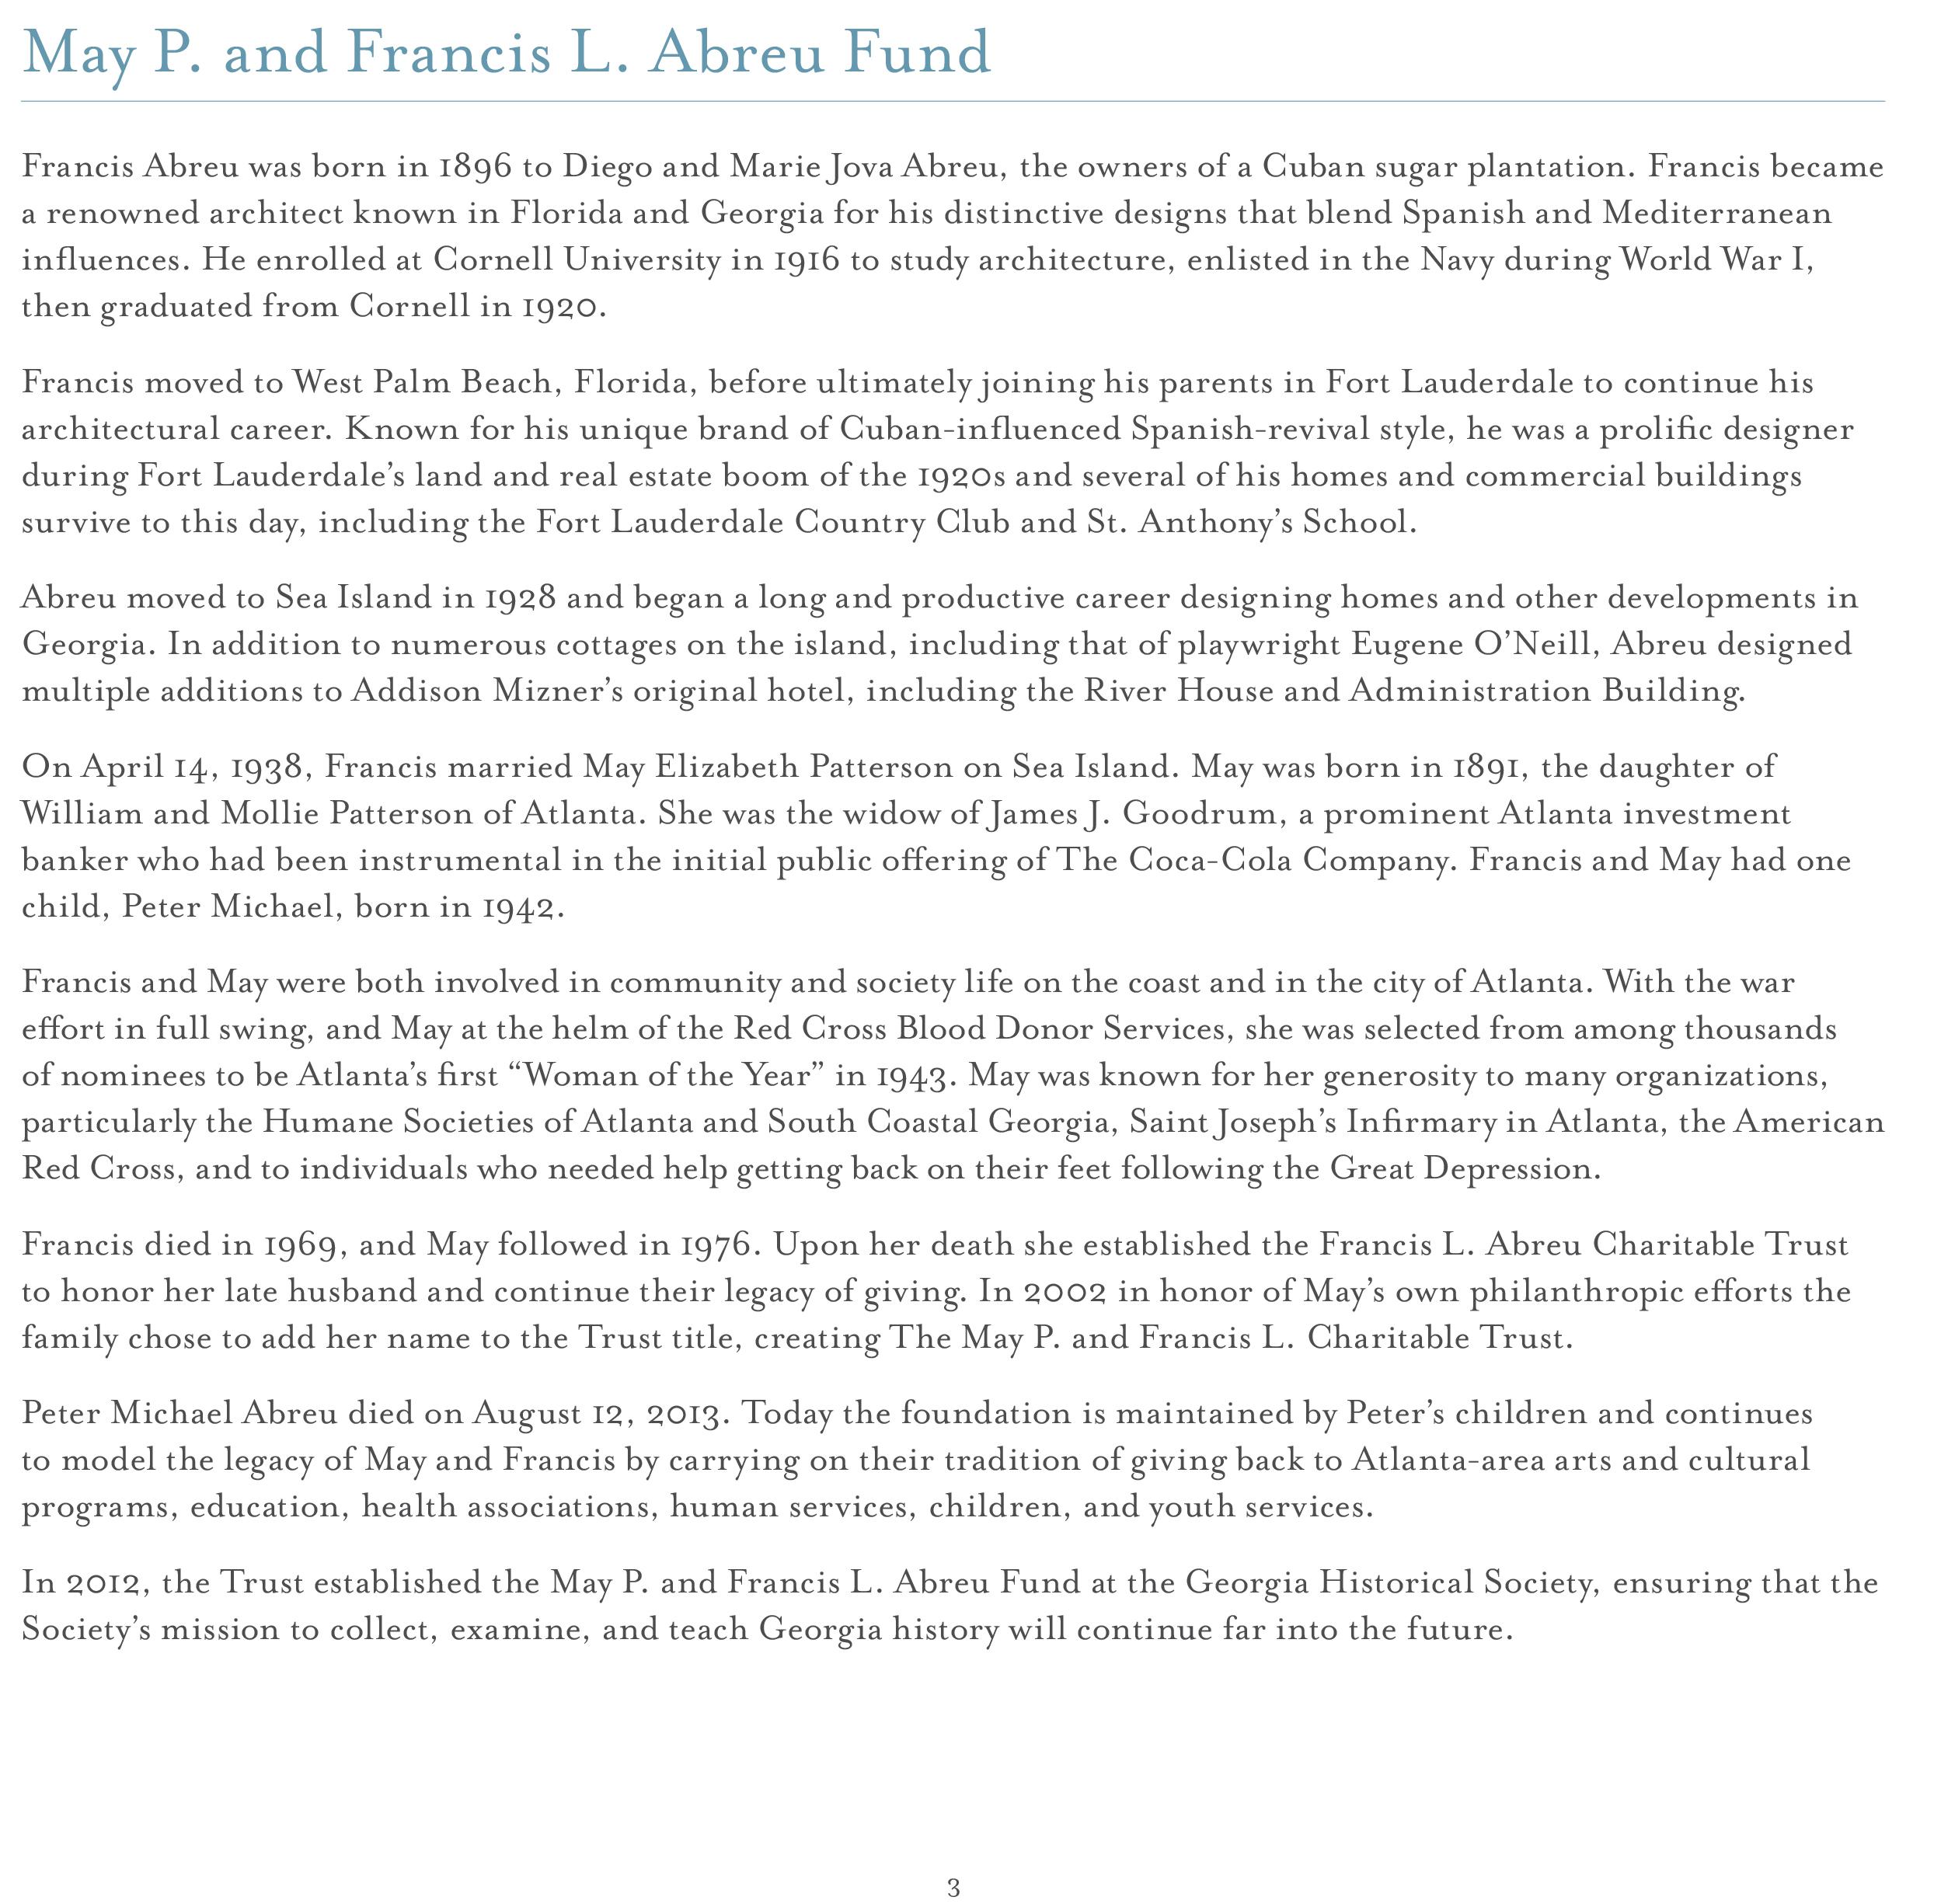 Endowment Campaign Georgia Historical Society